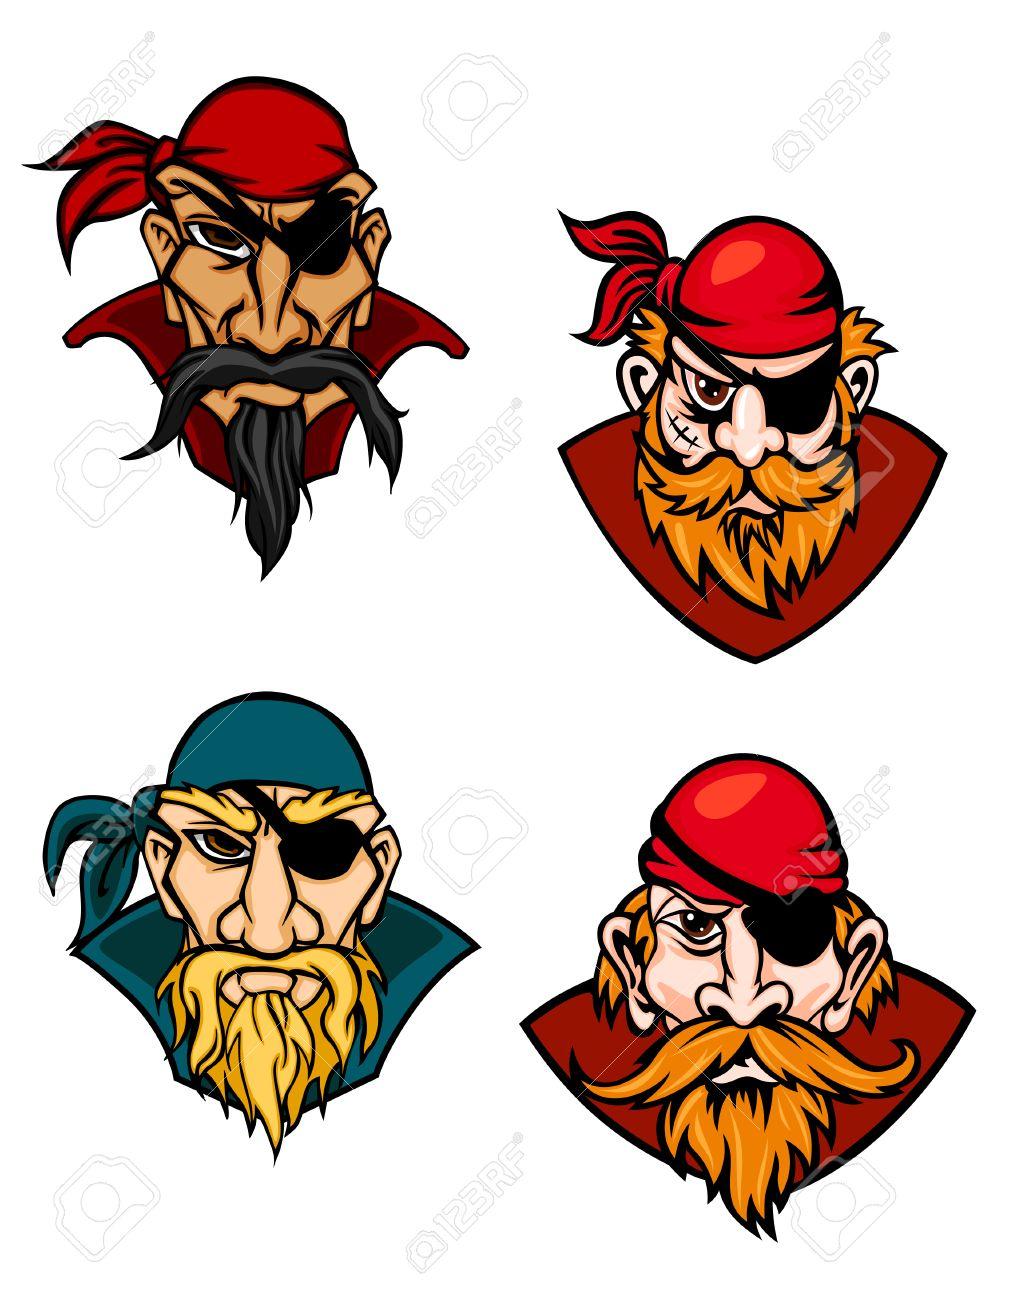 1017x1300 Old Danger Pirates, Buccaneers, Corsairs And Sailors In Cartoon